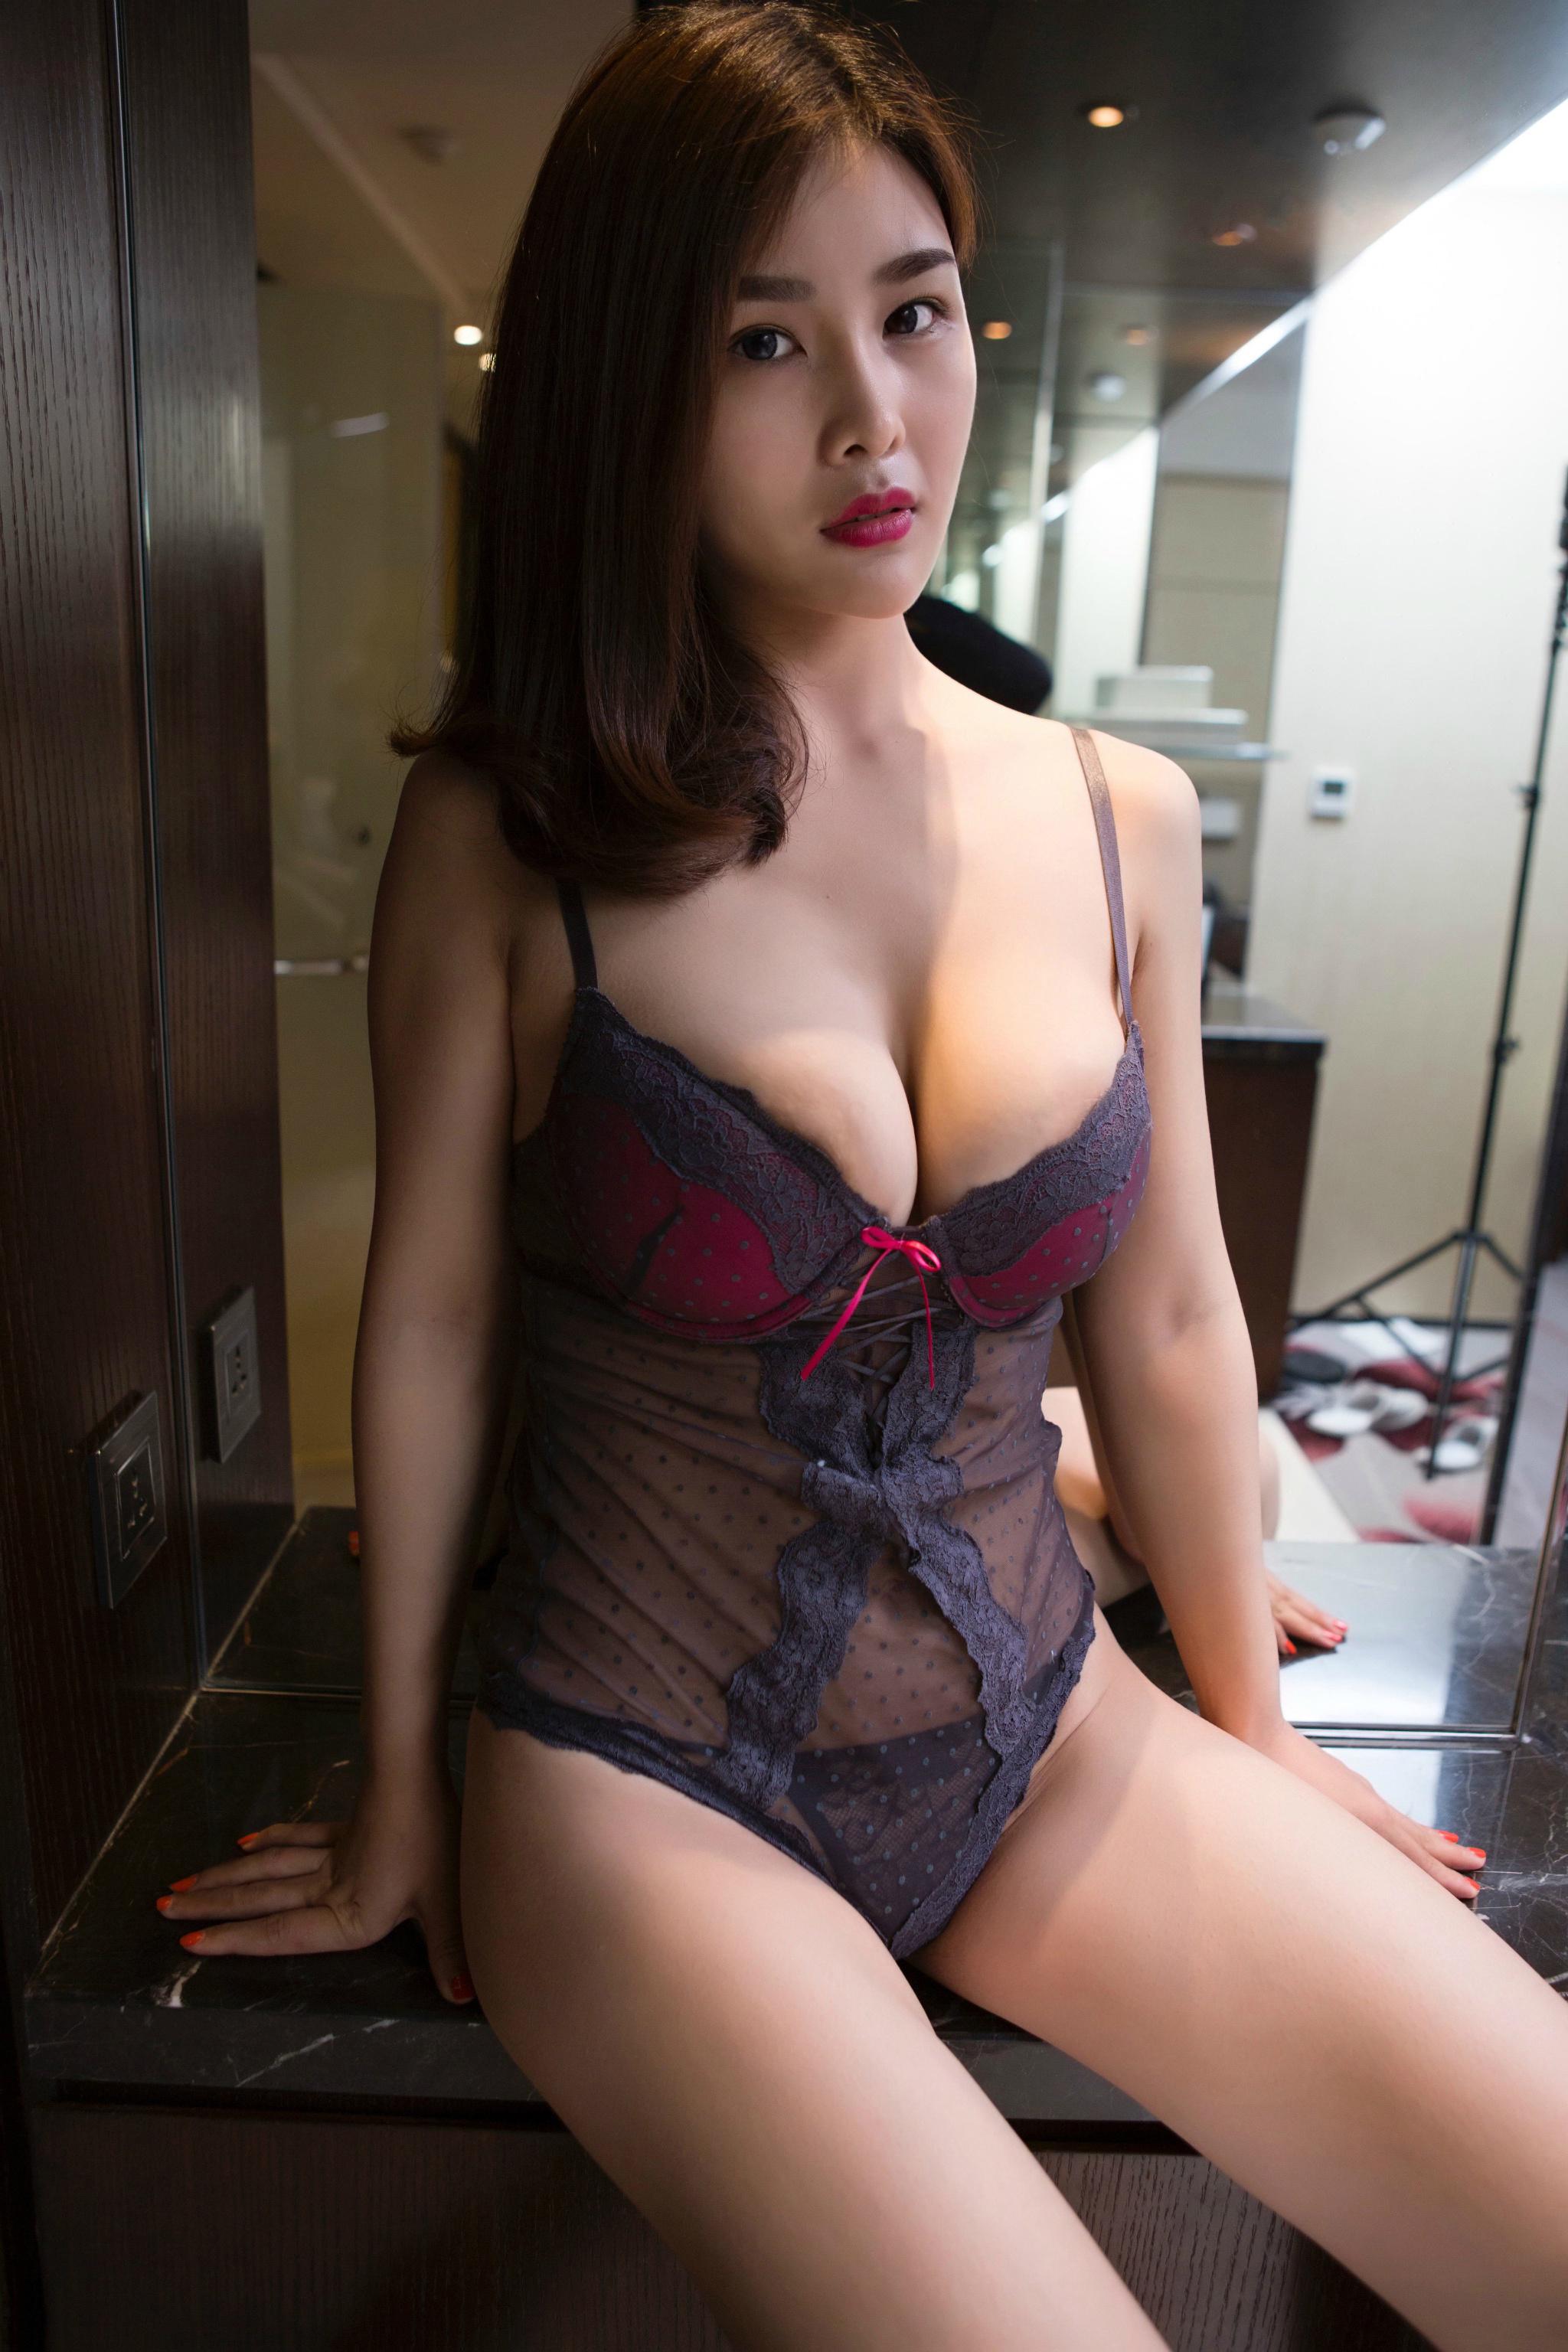 Boobs model